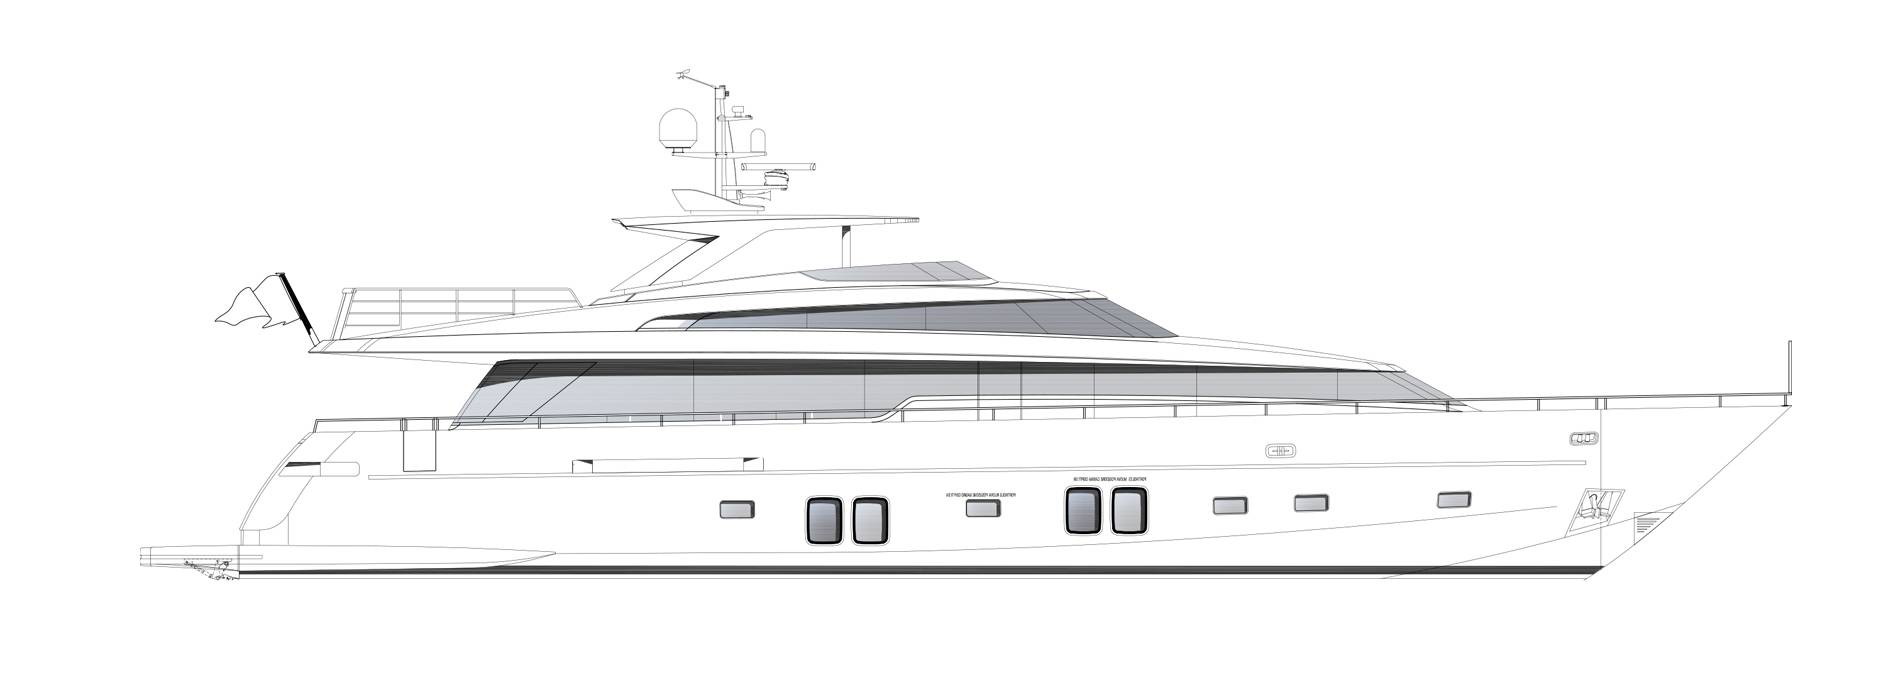 Sanlorenzo Yachts SL96-684 Profilo